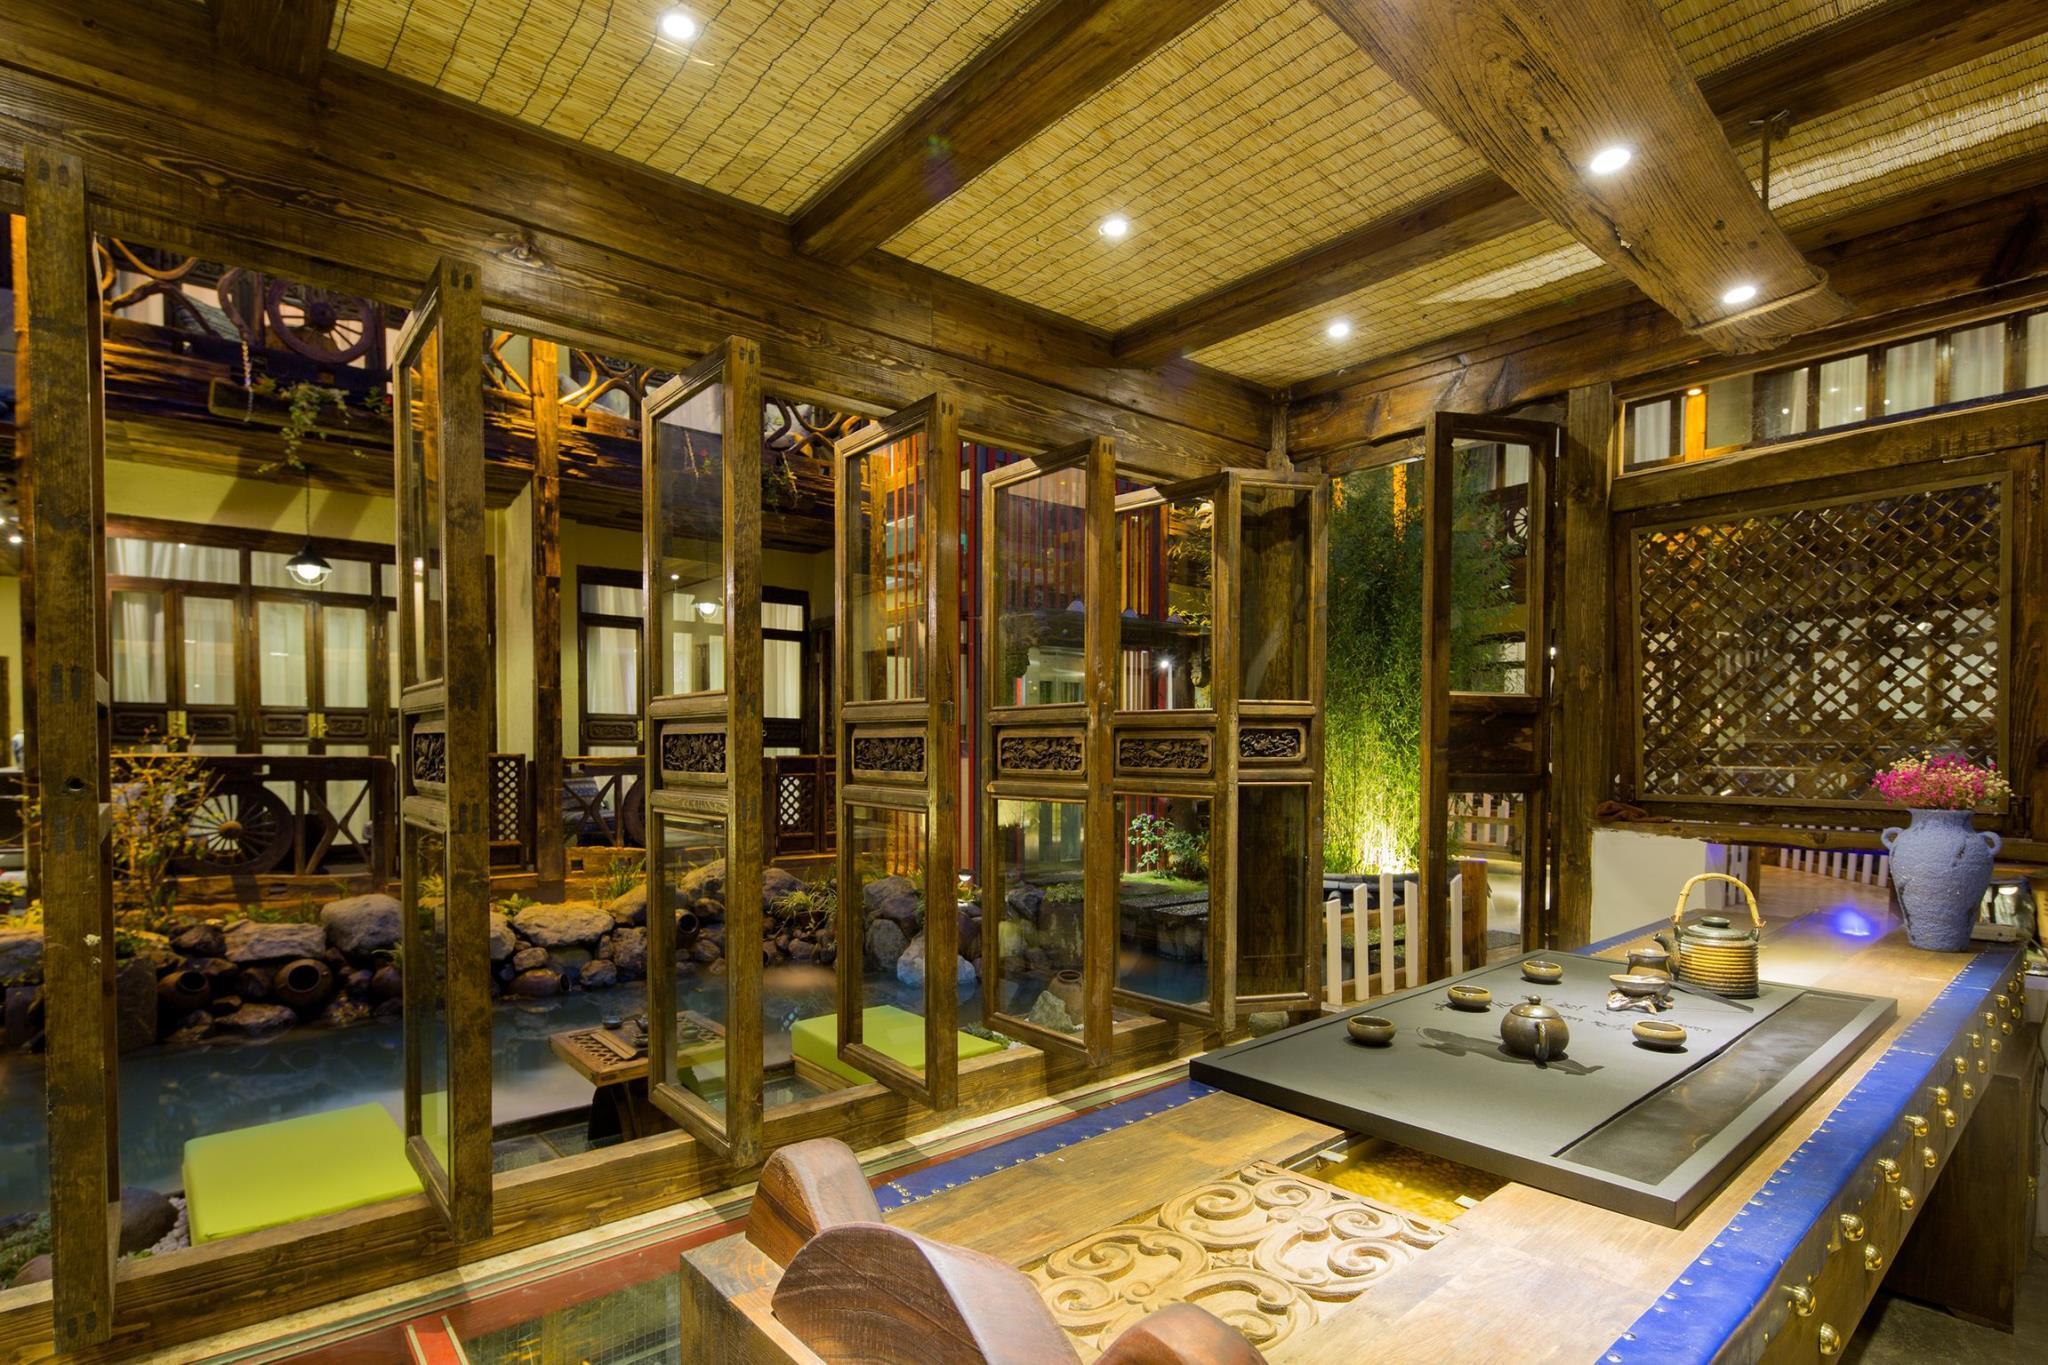 China Old Story Inns Lijiang Garden